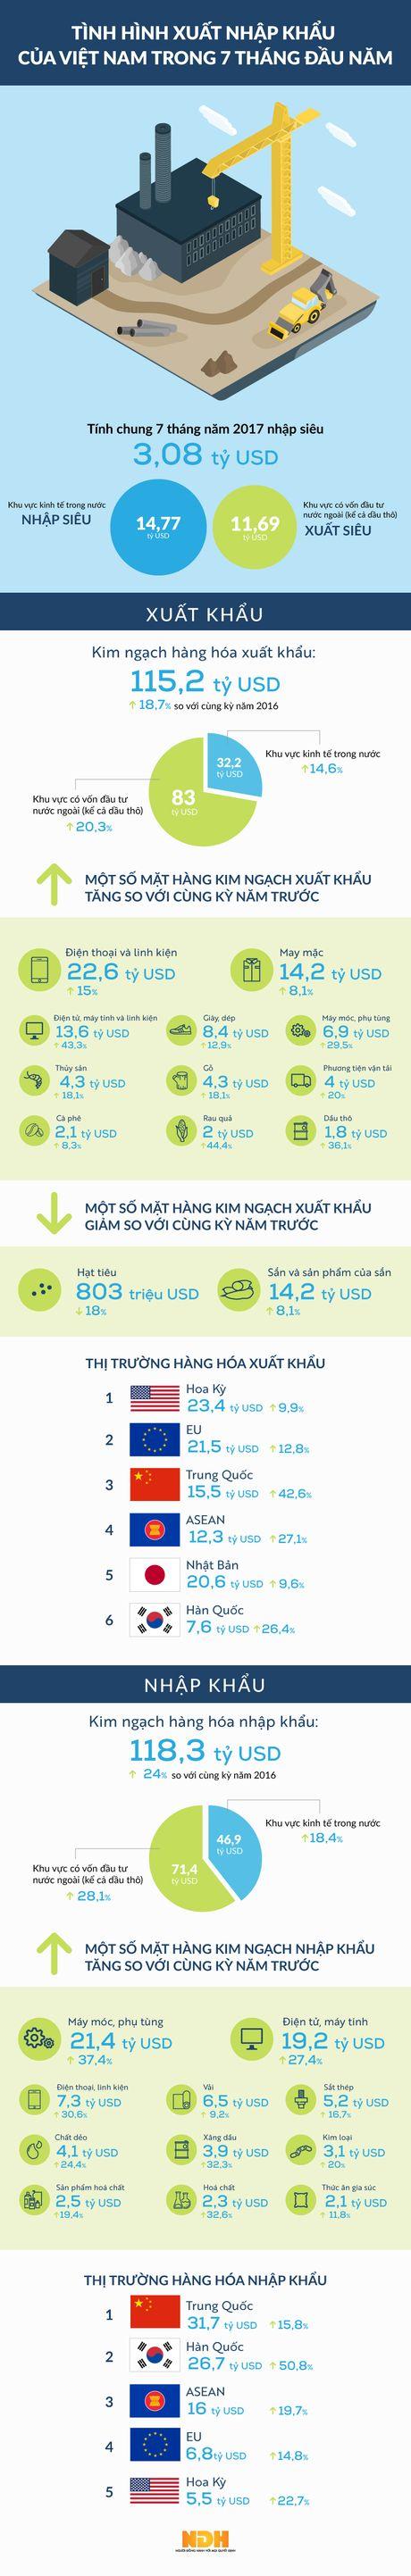 Viet Nam nhap sieu 3,08 ty USD 7 thang dau nam 2017 - Anh 1